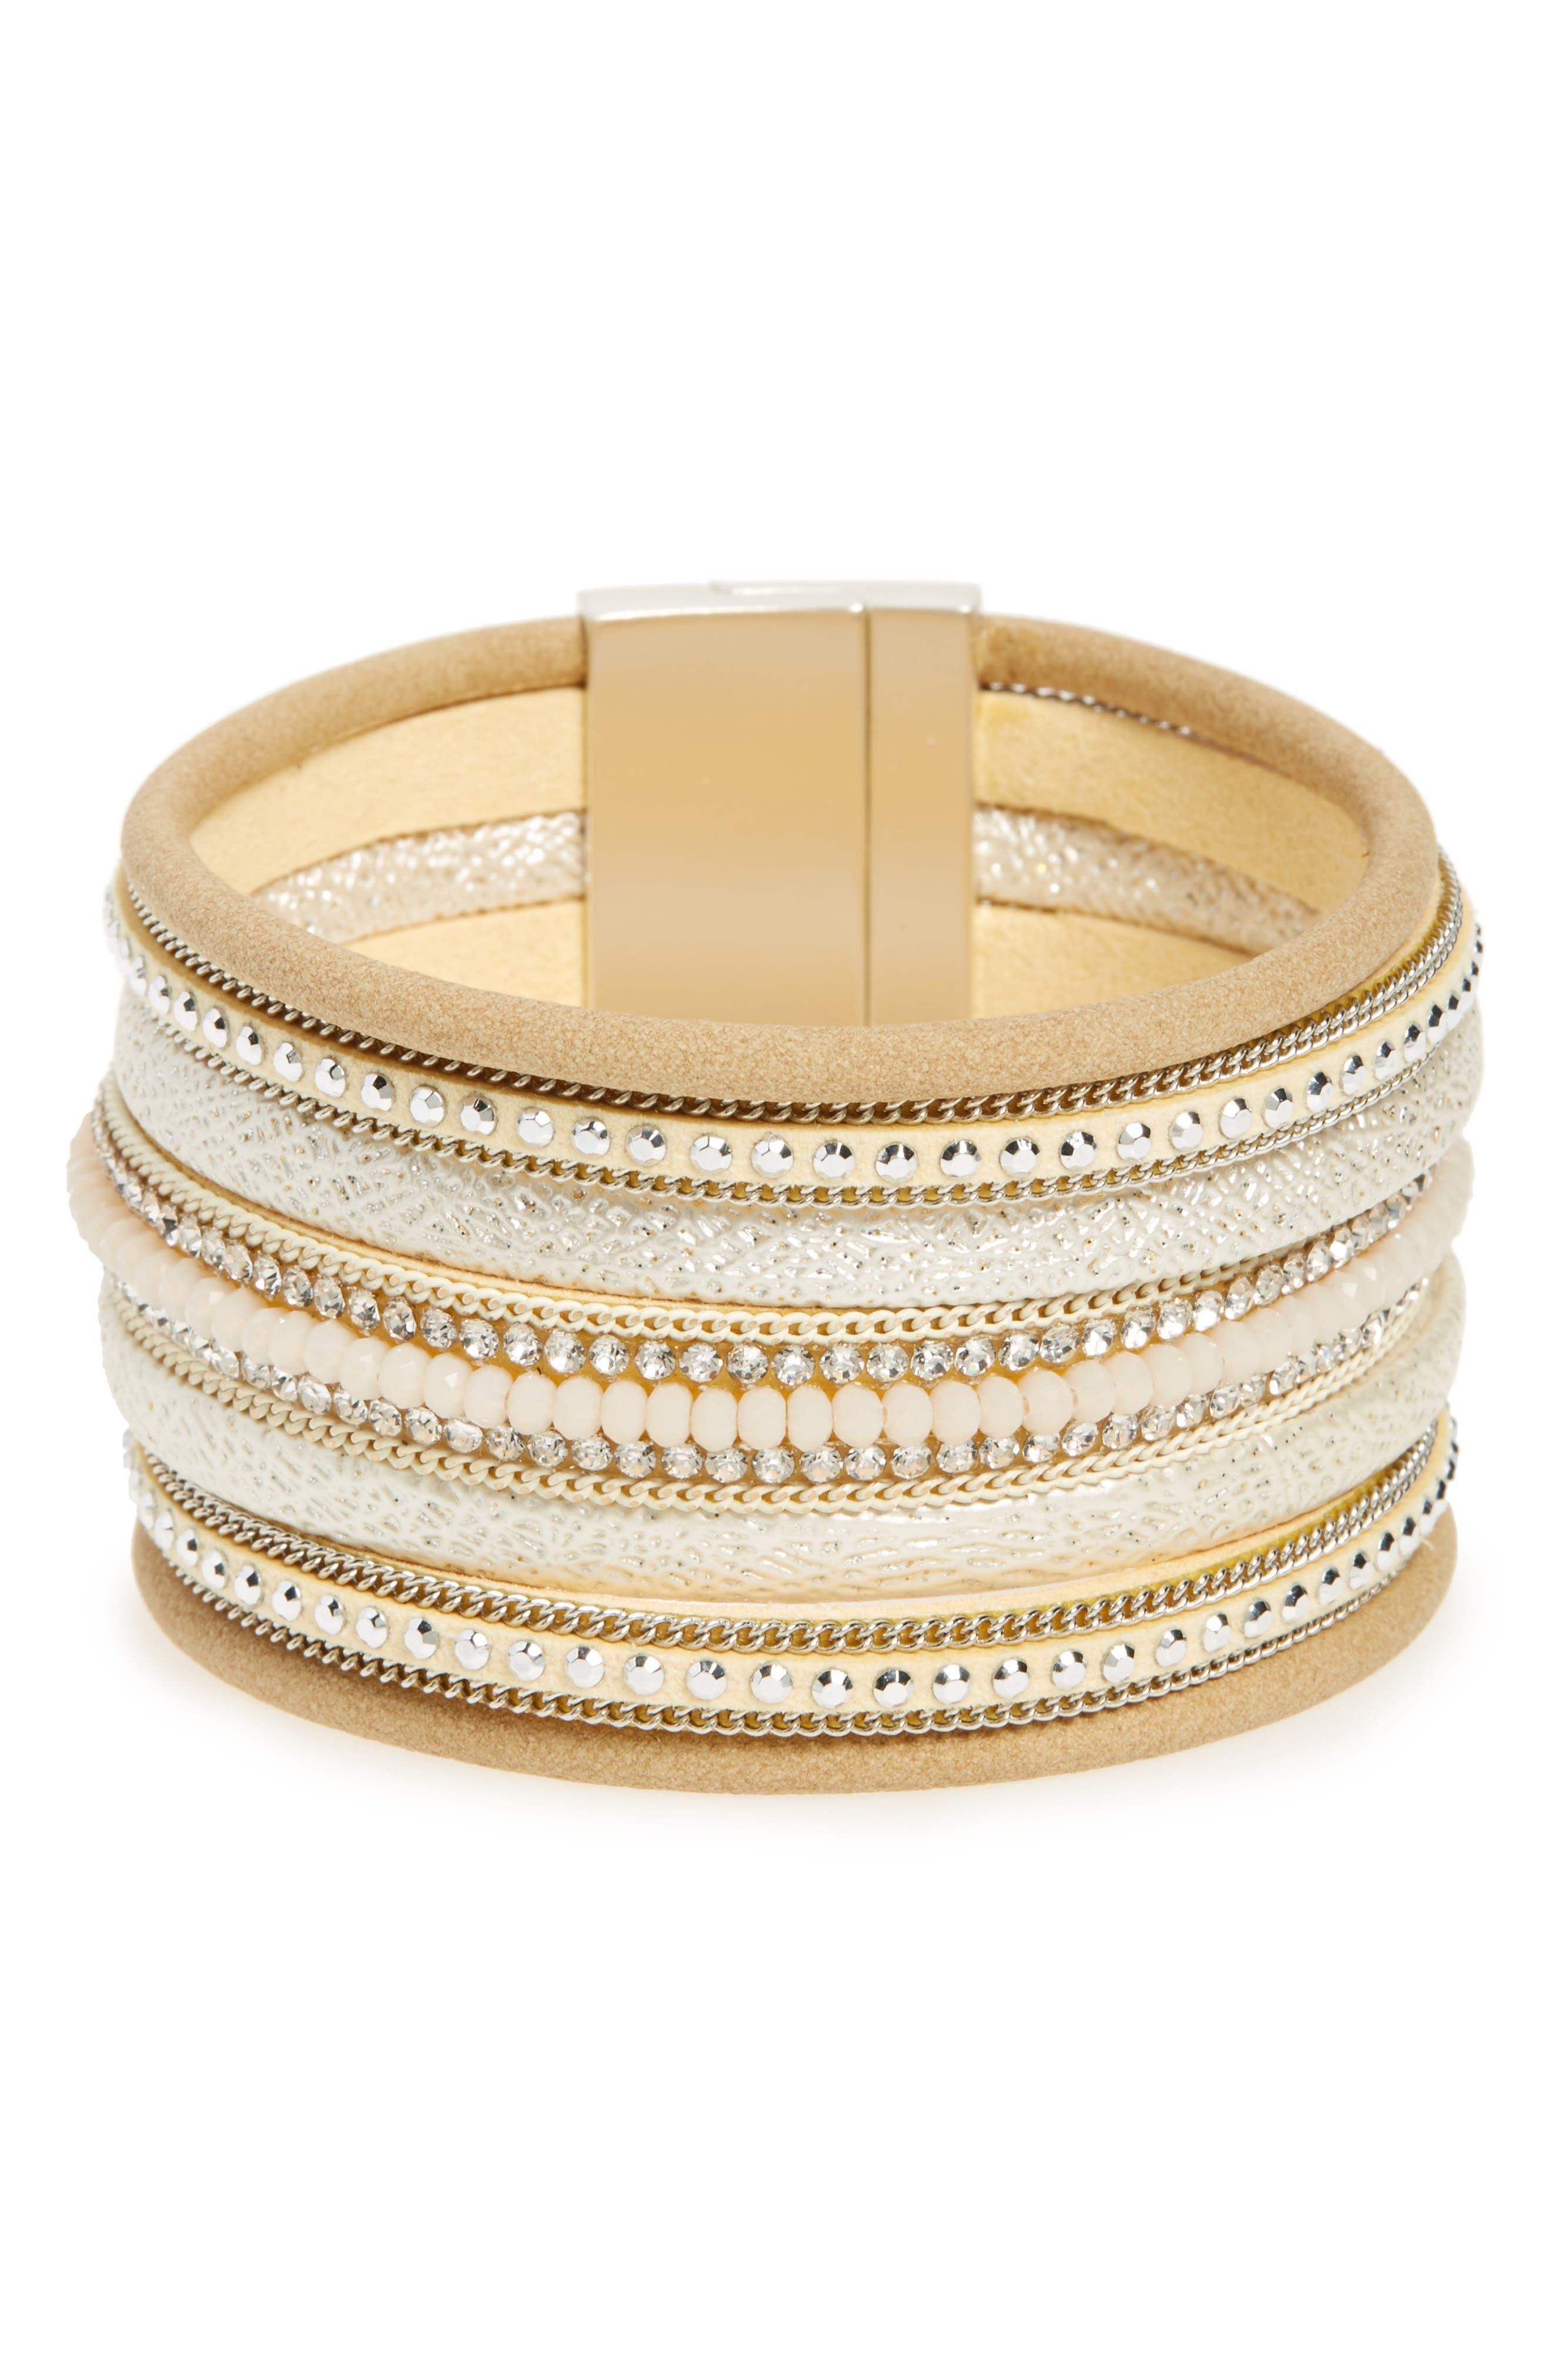 Multirow Bracelet,                         Main,                         color, 200